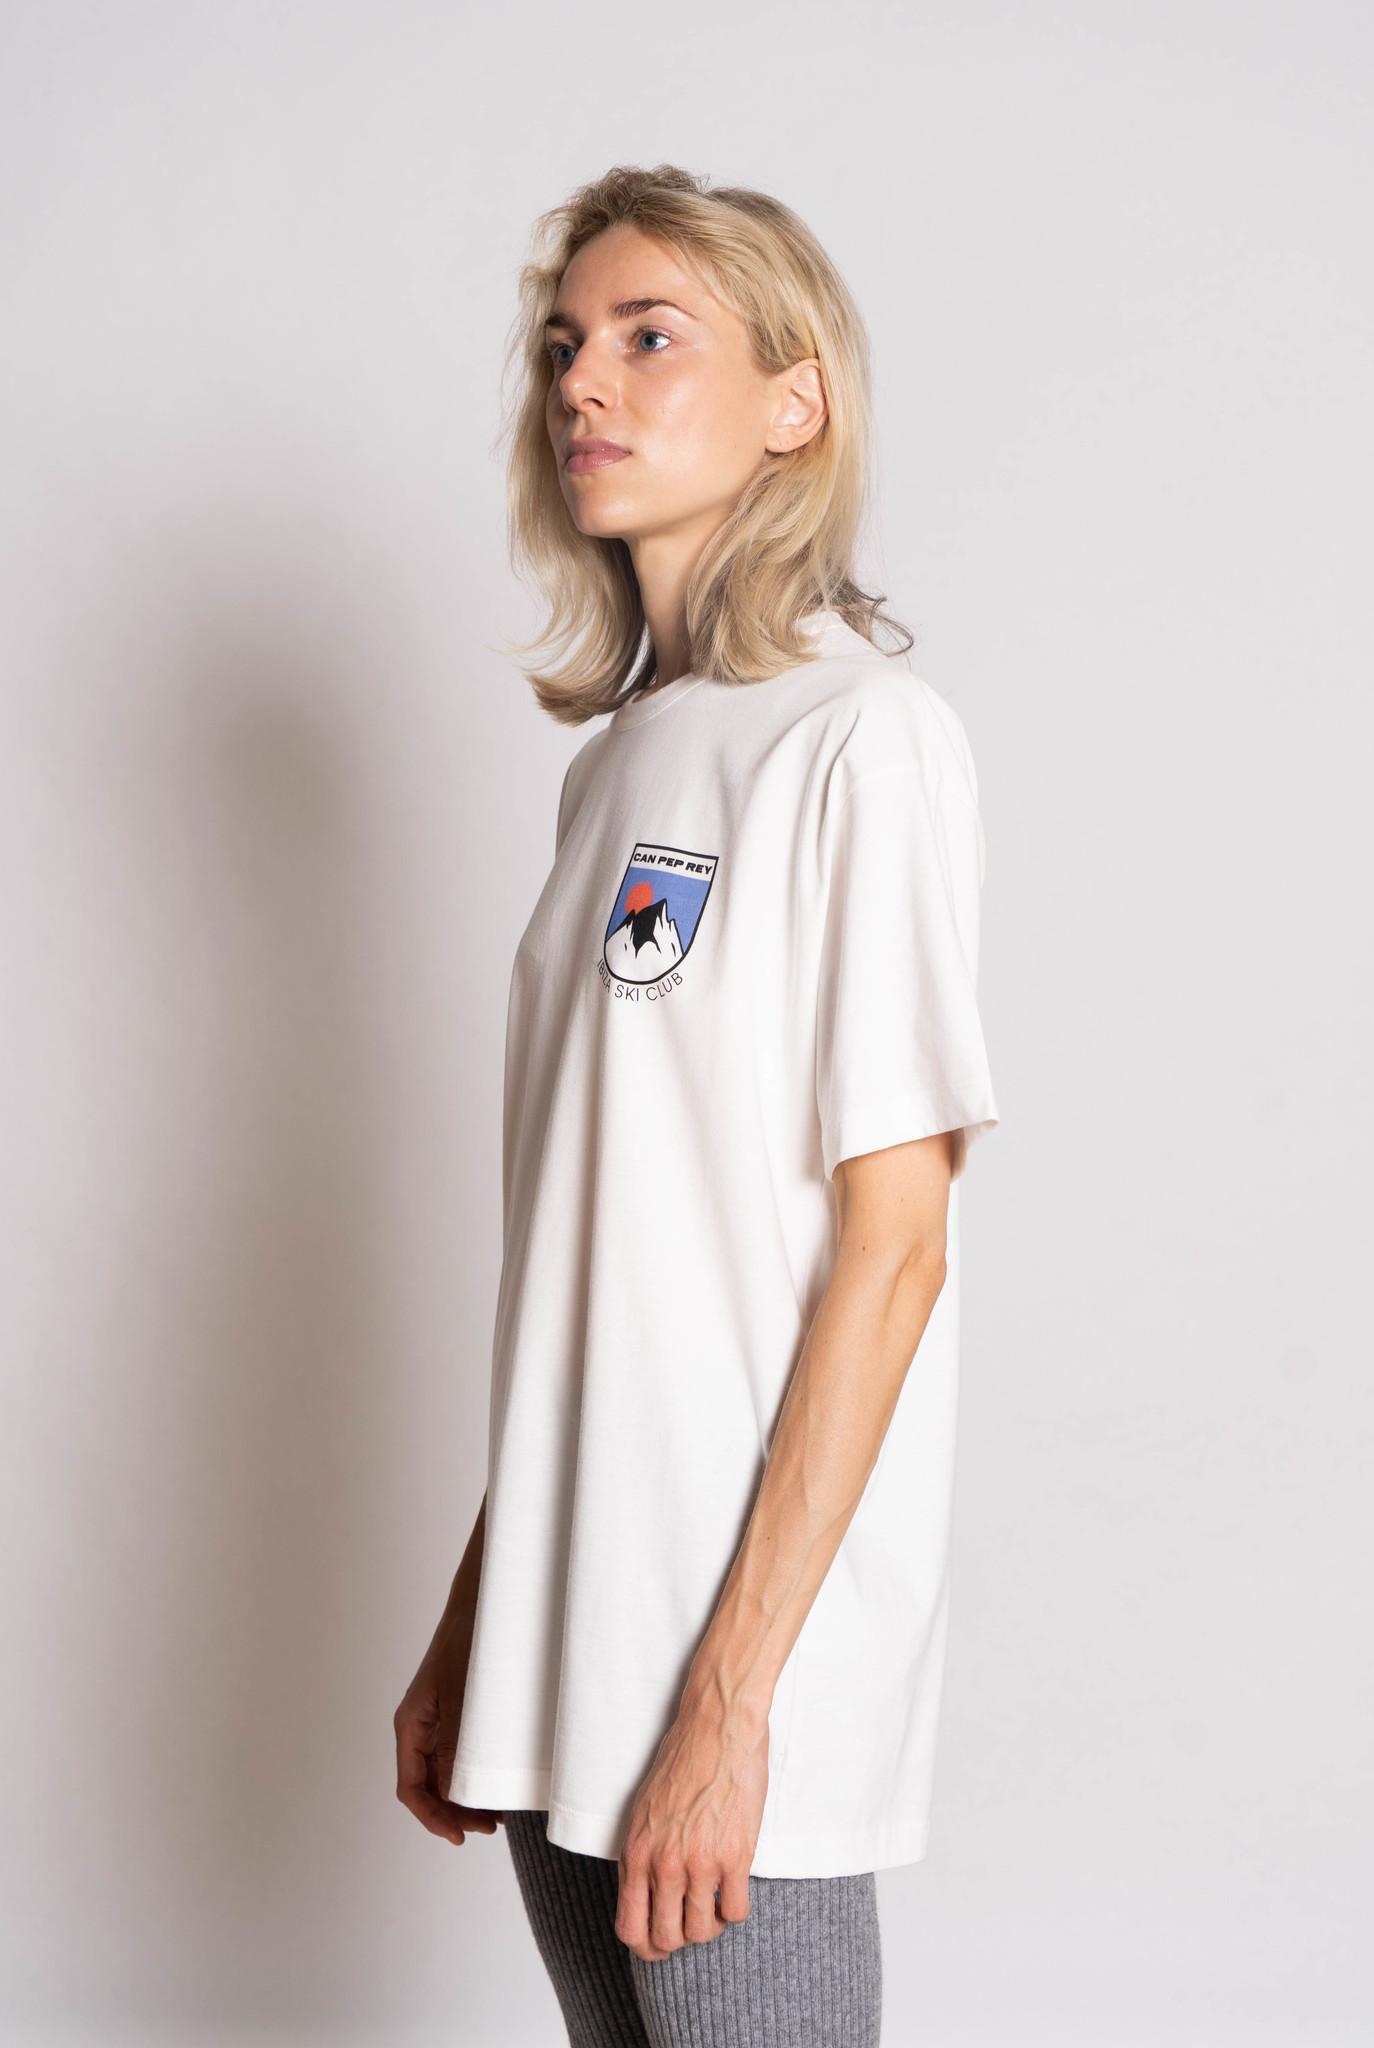 Unisex  S/S T-shirt Off White Frontprint